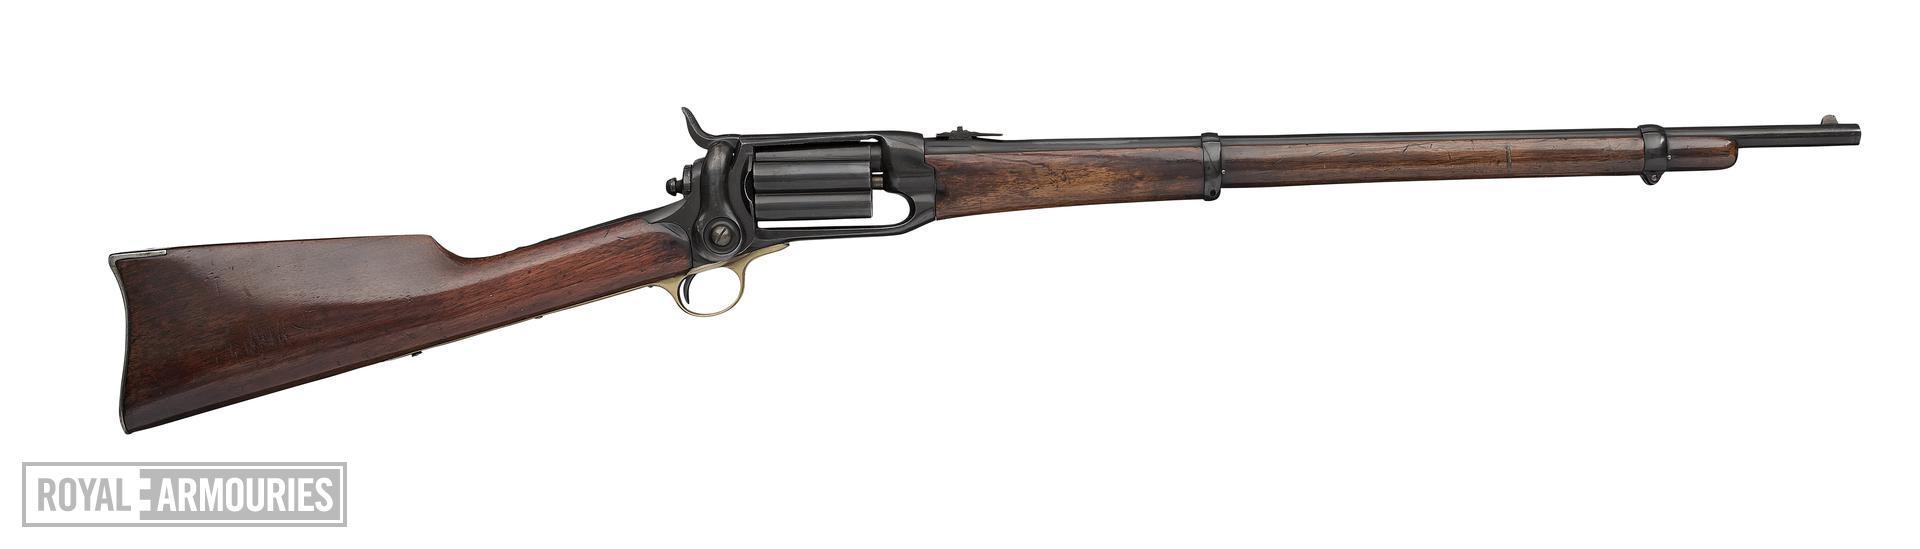 Centrefire five-shot revolver carbine